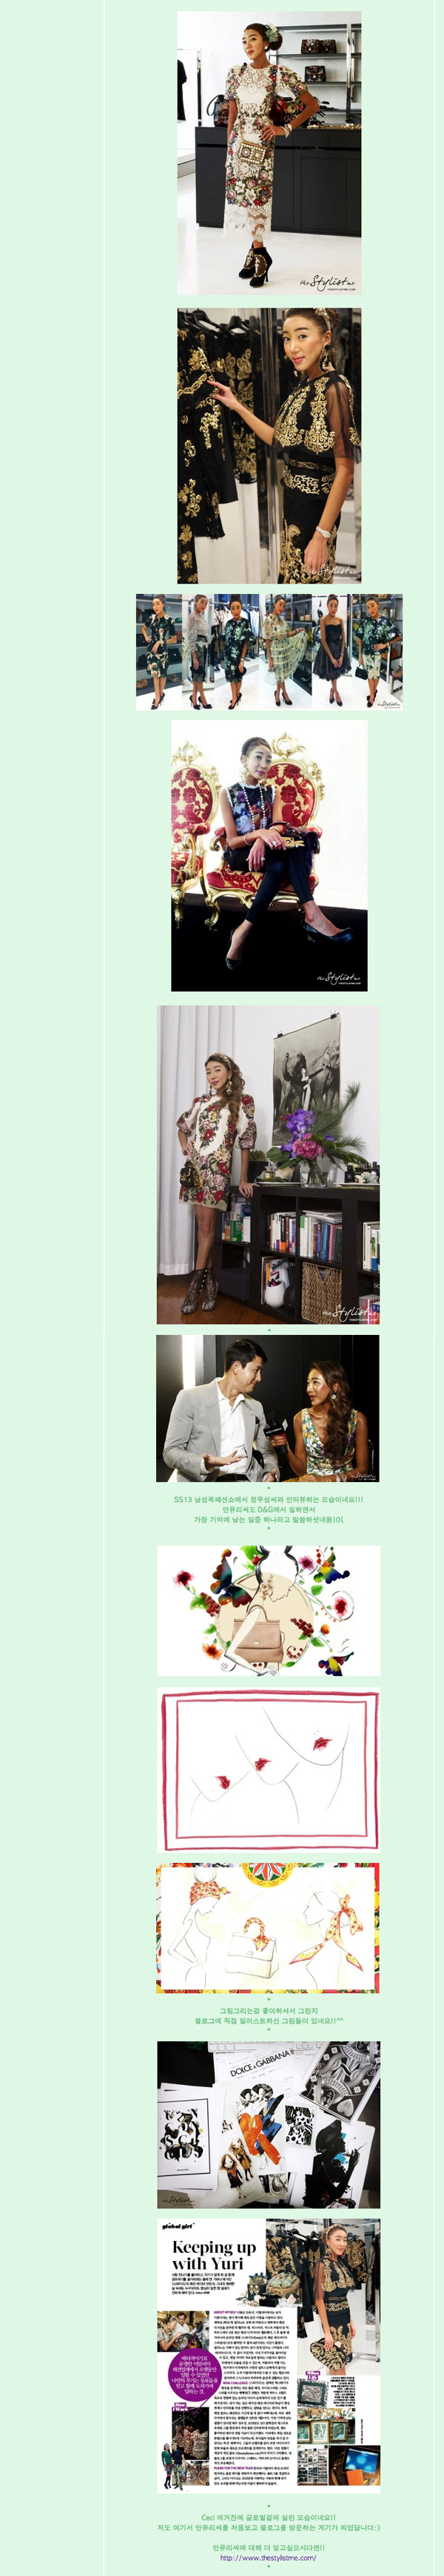 02-korean-blog-워니-jyo5618-presents-yuriAhn-fashion-editor-Swide-web-magazineDolce-and-Gabbana